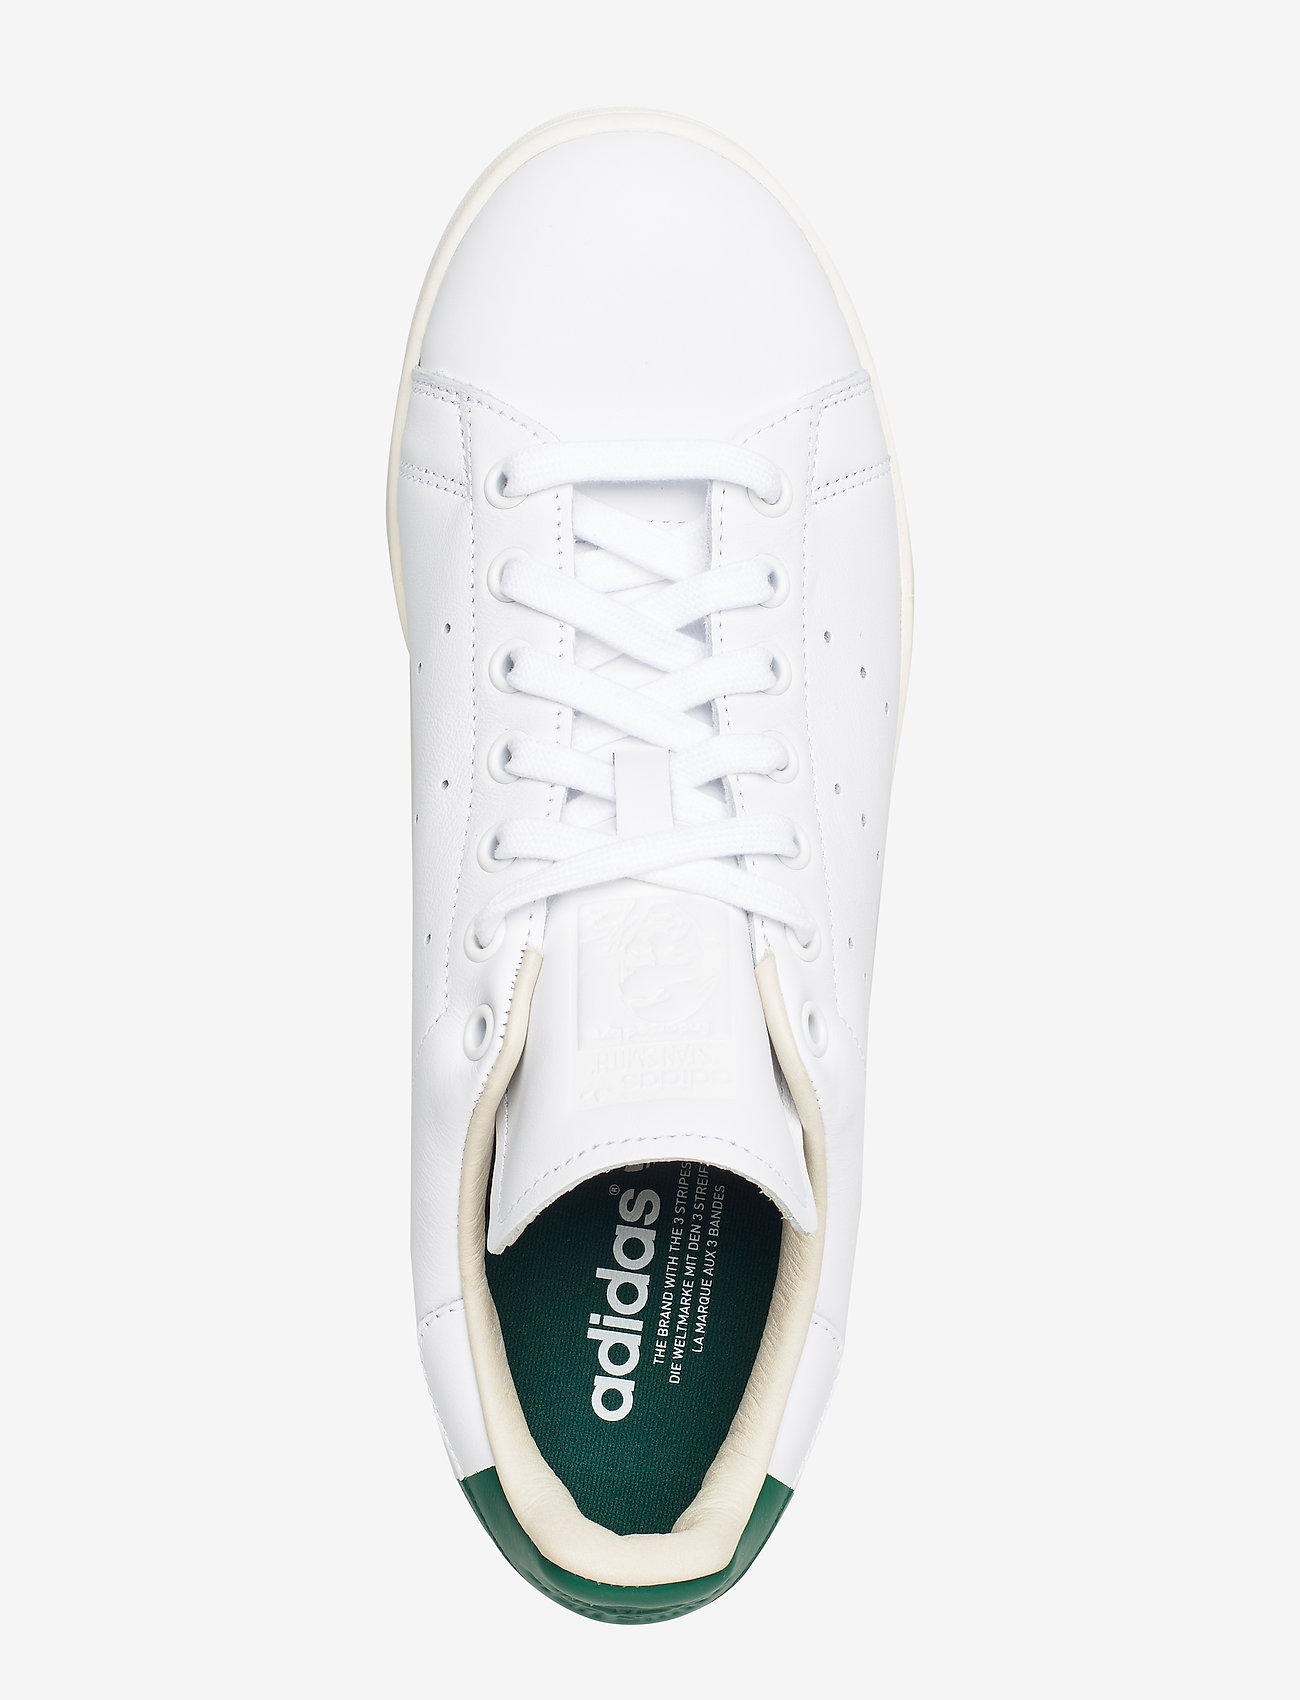 Stan Smith (Ftwwht/cgreen/owhite) - adidas Originals